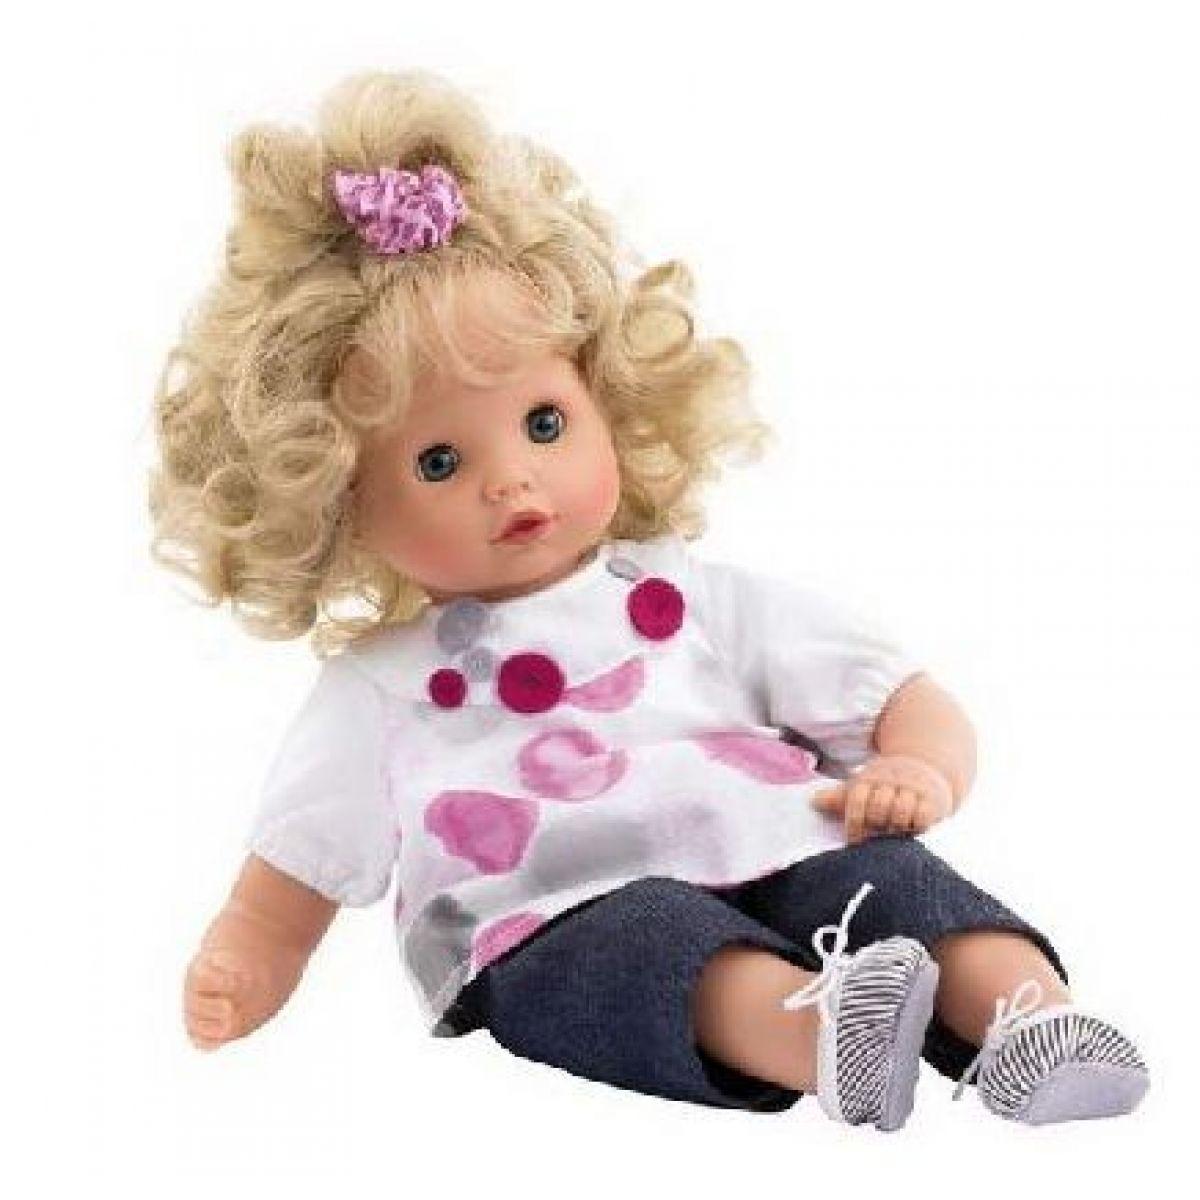 Götz 20955 - Panenka Muffin 33 cm - blond vlasy